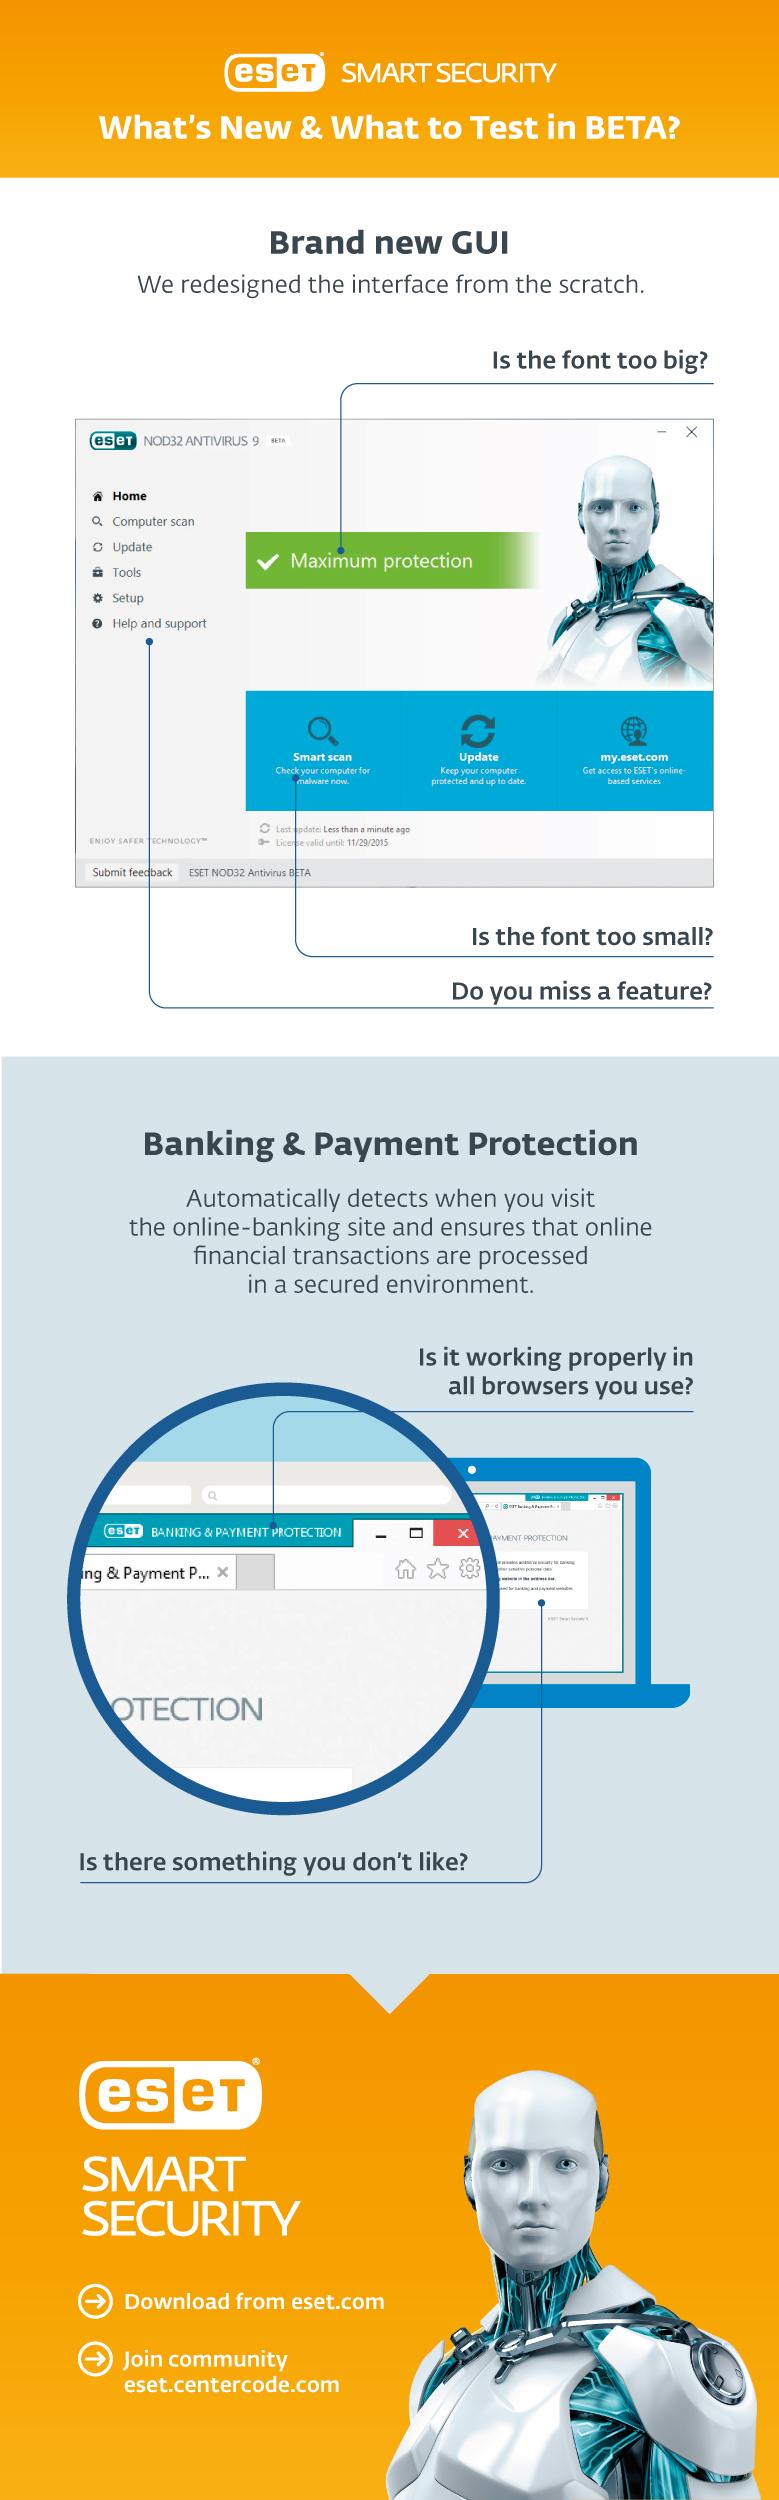 V9_BETA_Infographic